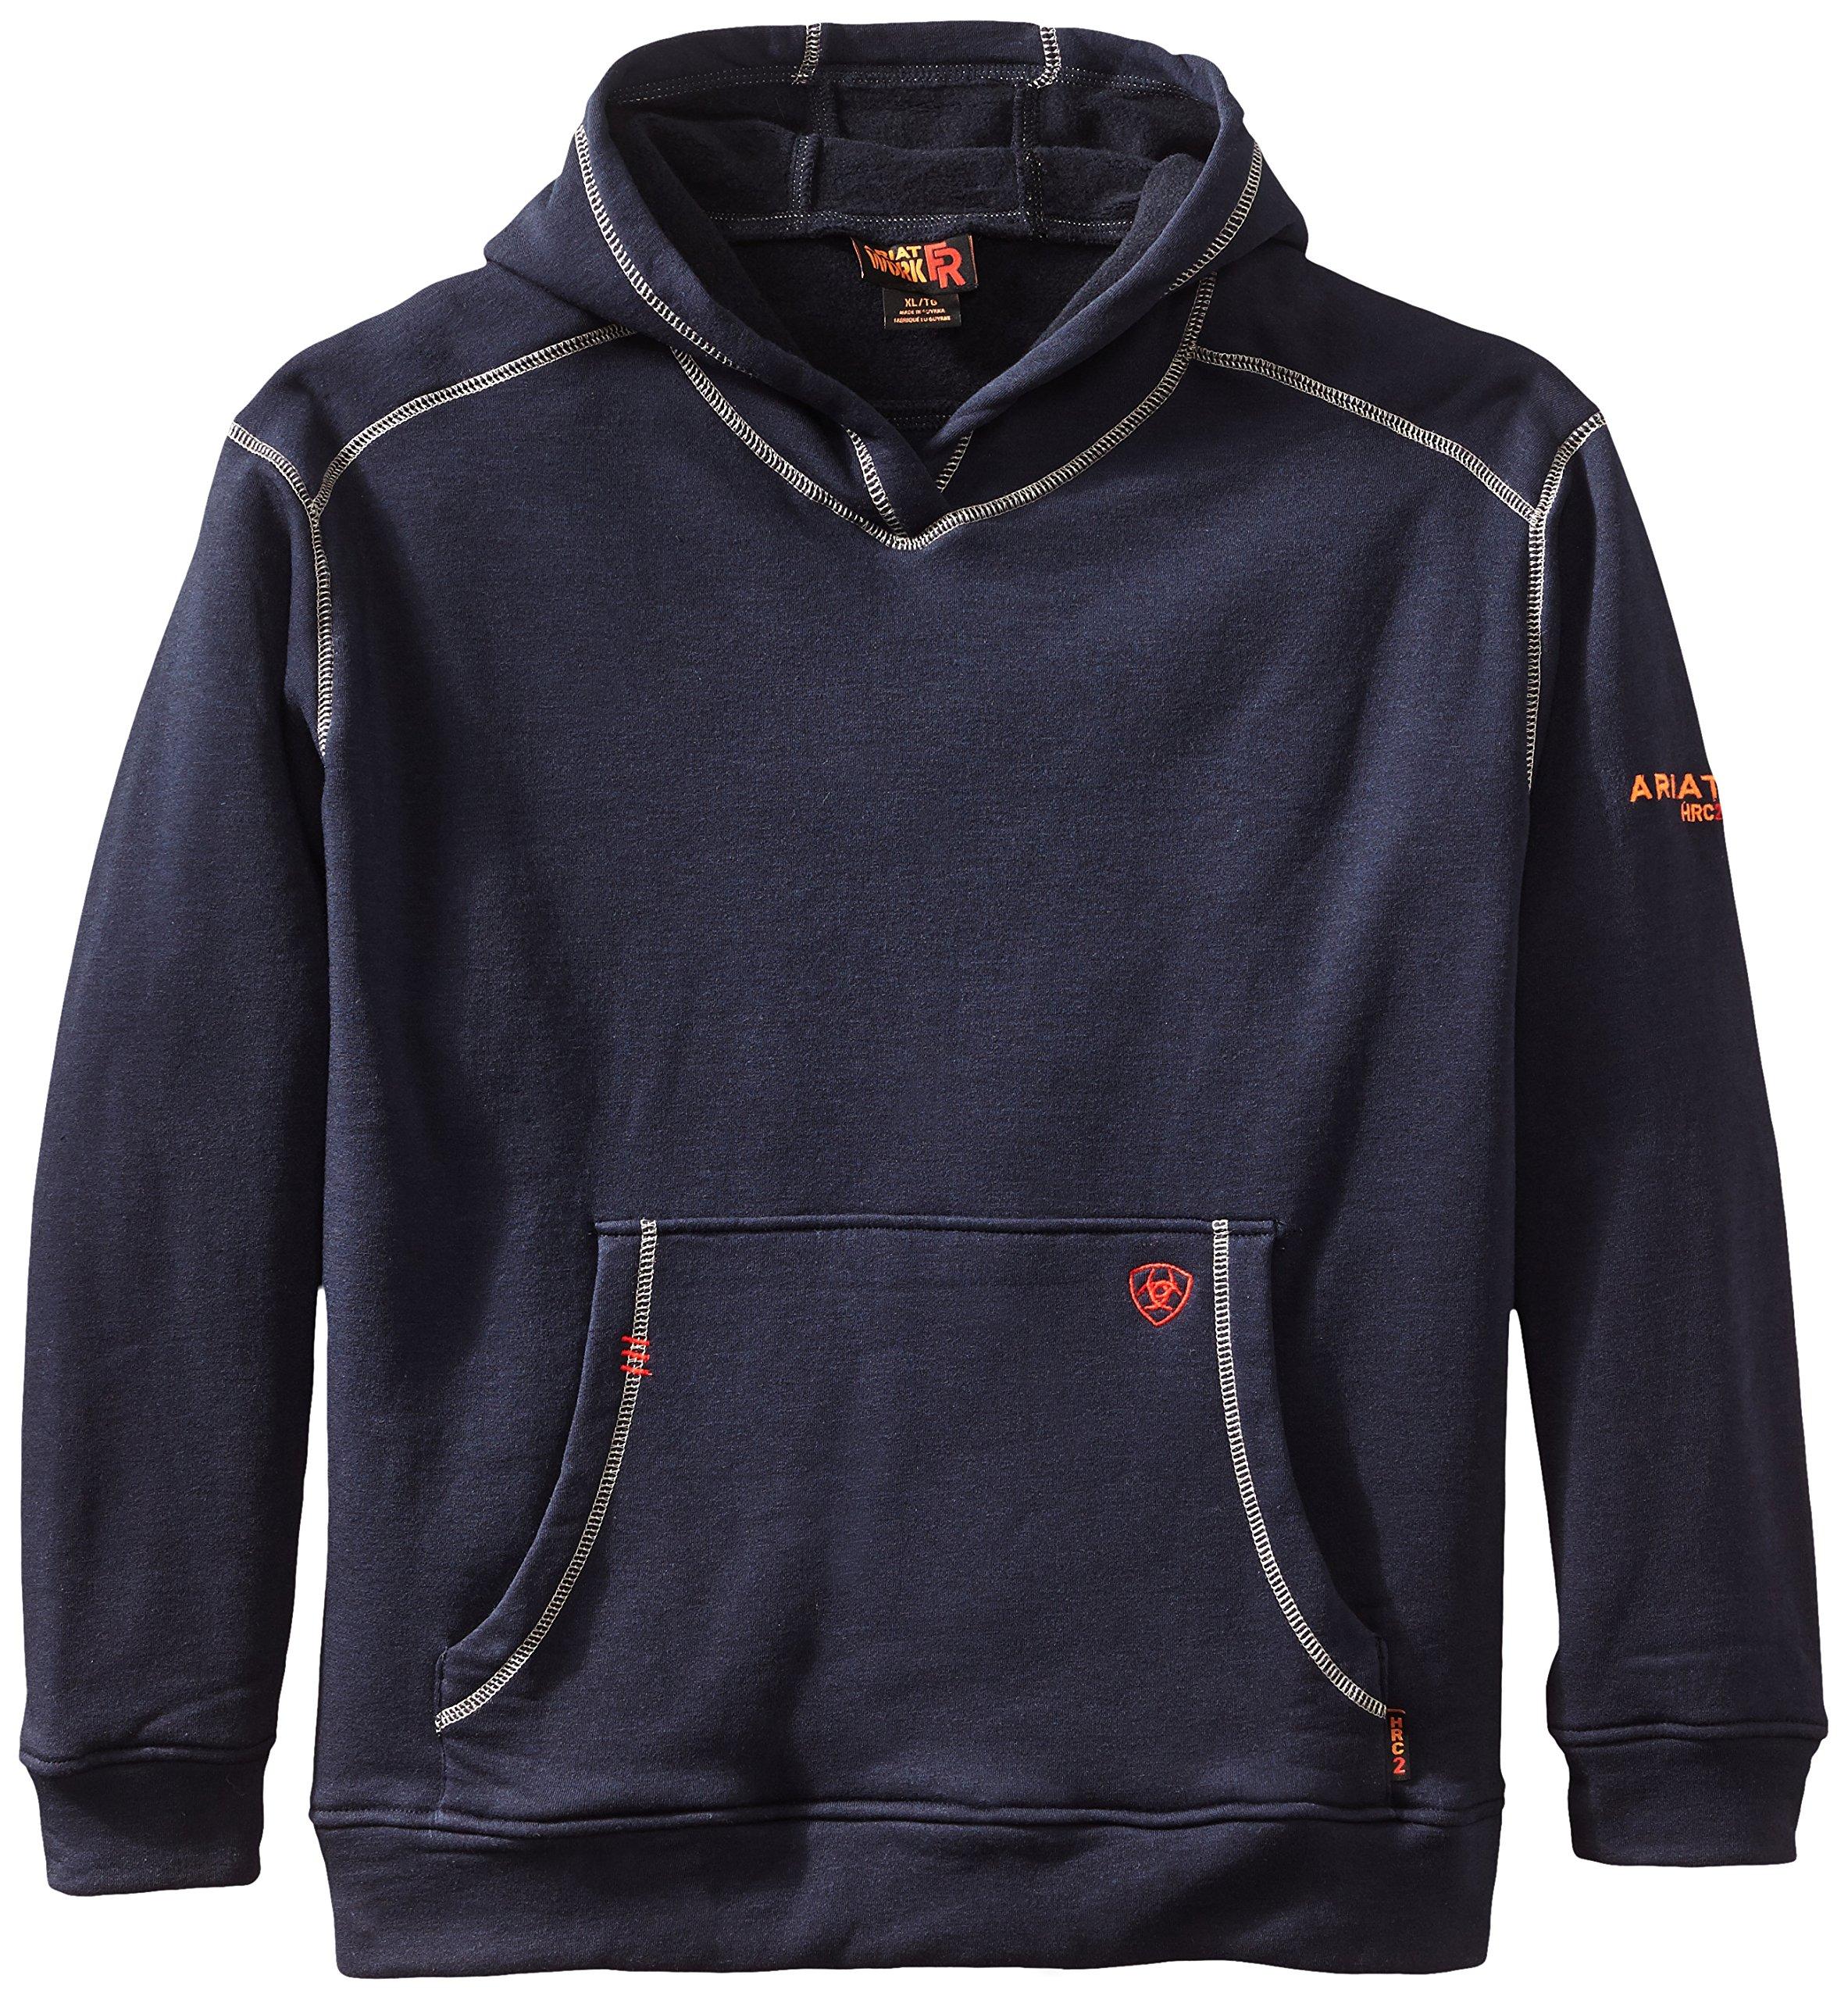 Ariat Men's Big and Tall Flame Resistant Polartec HoodieShirt, Navy, X-Large